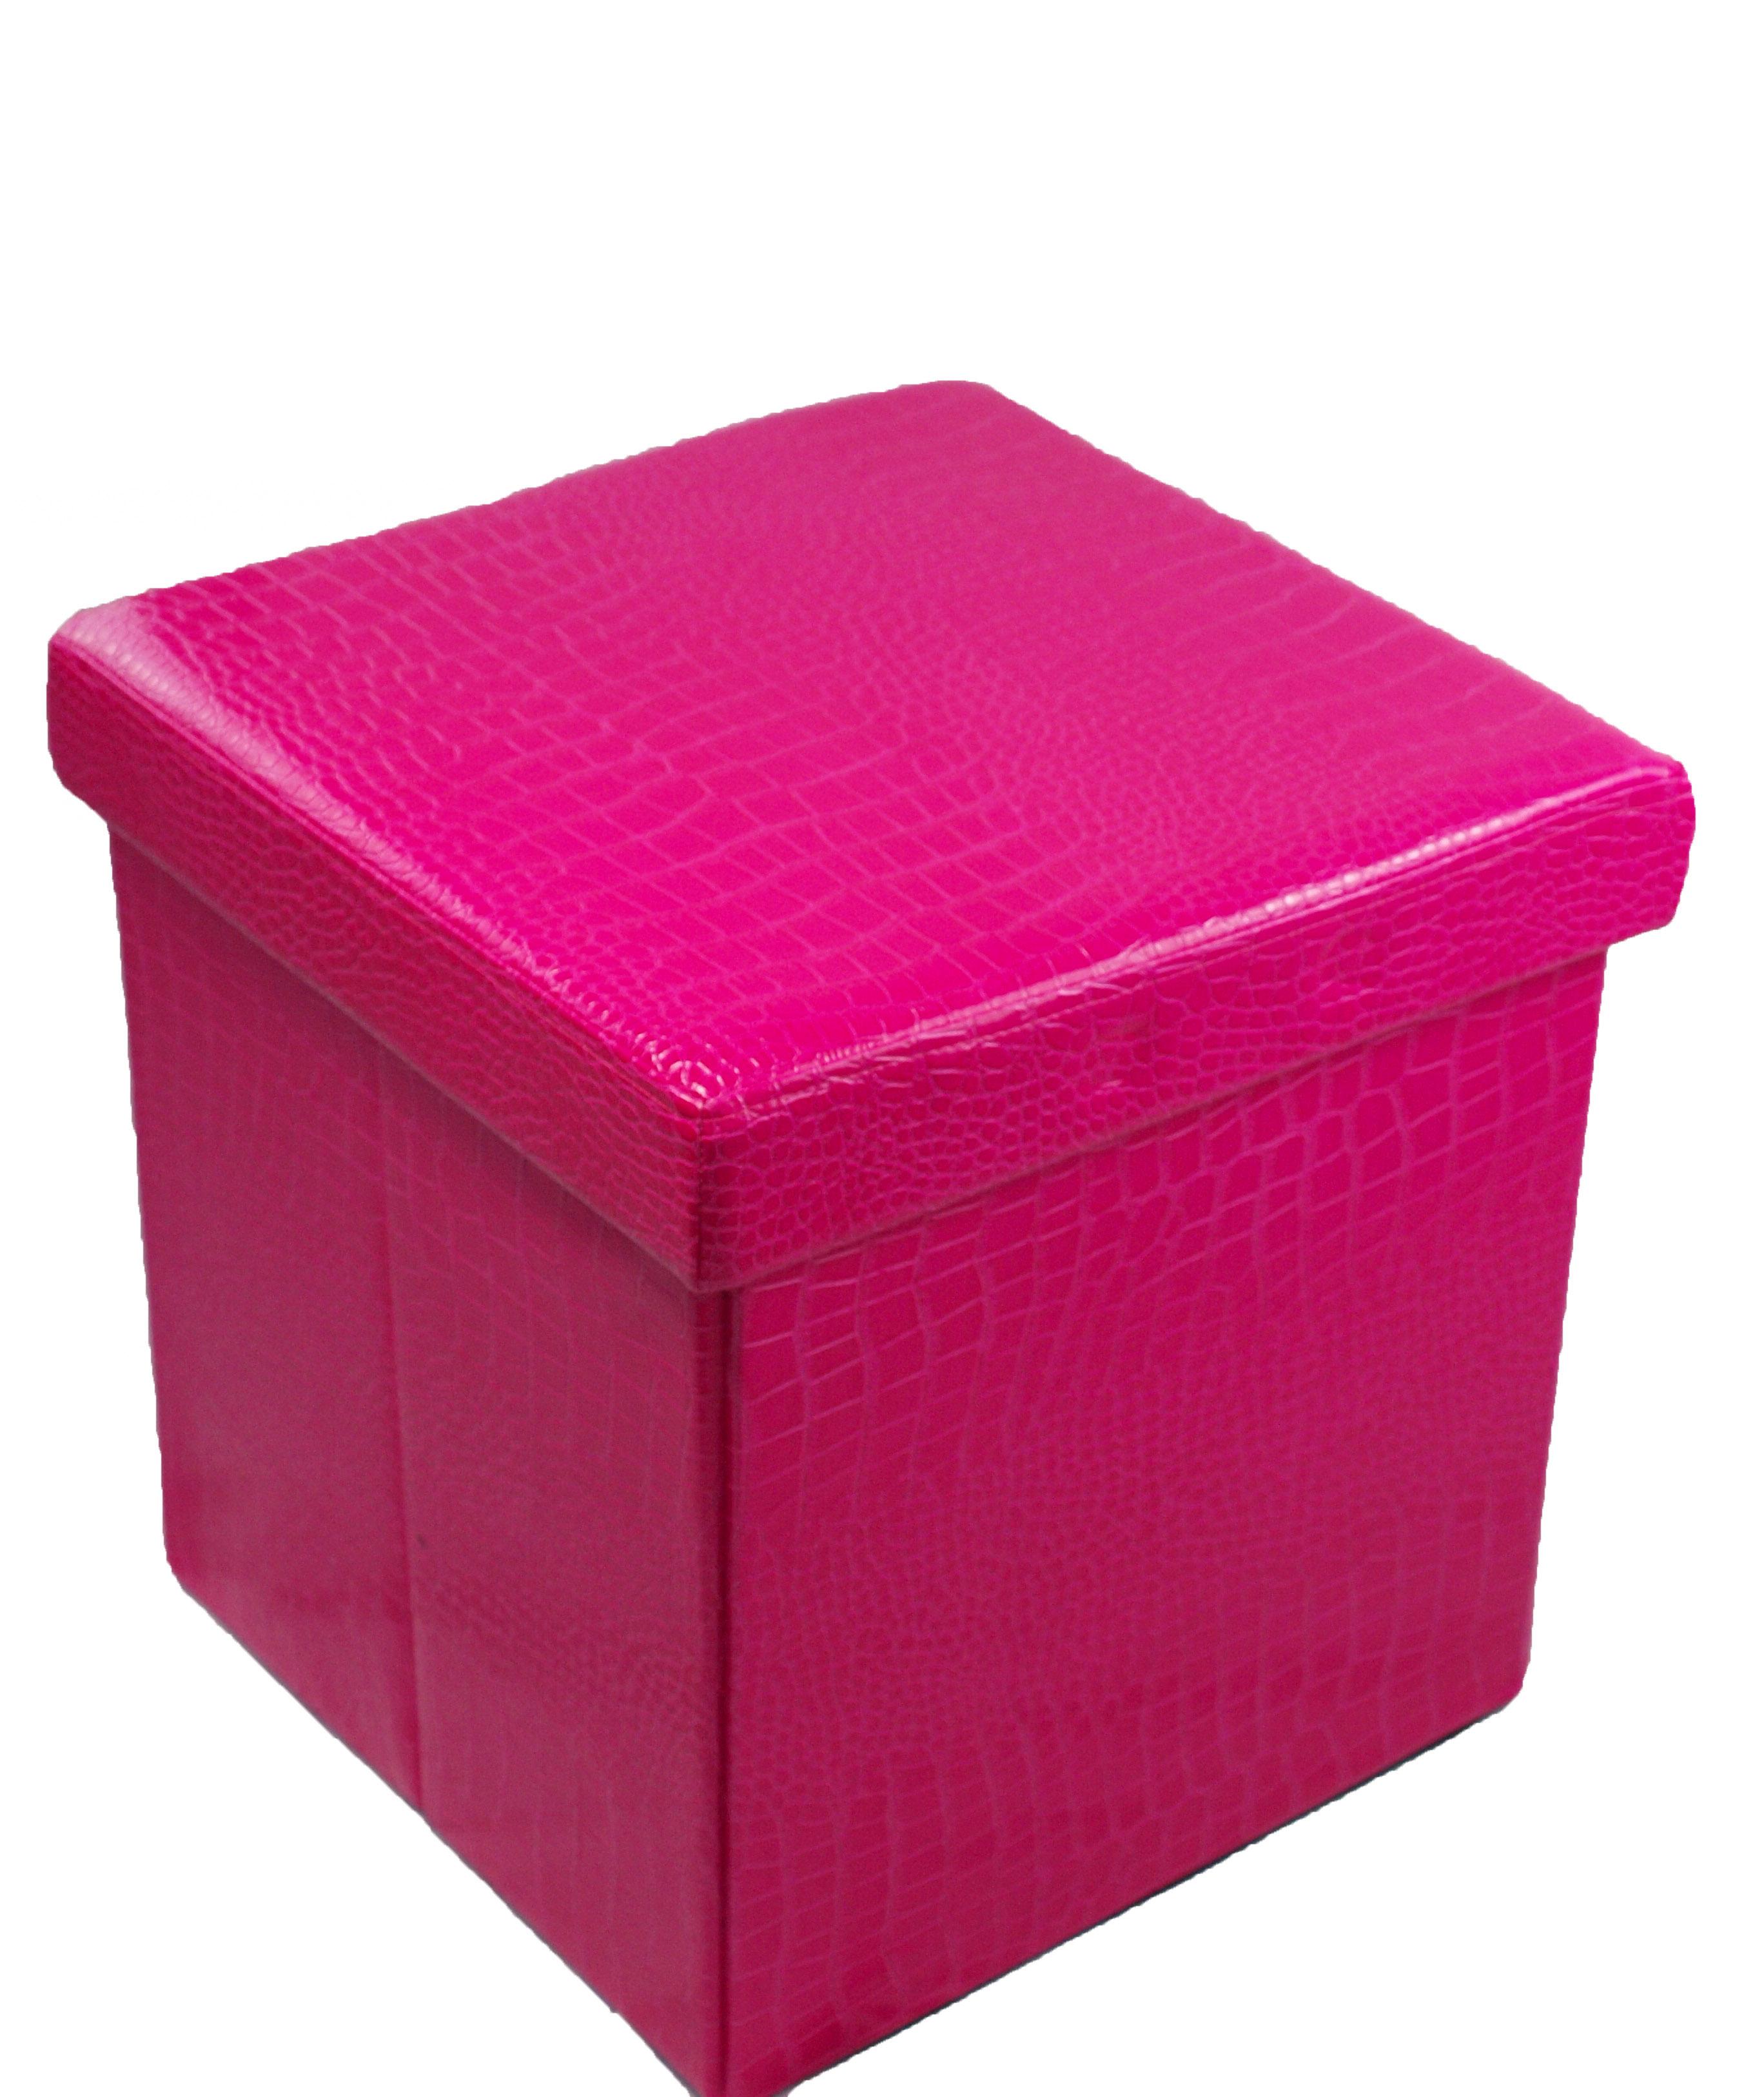 ... Multi Purpose Crocodile Folding Ottoman Storage Box/Chair In Fuschia  Thumbnail 3